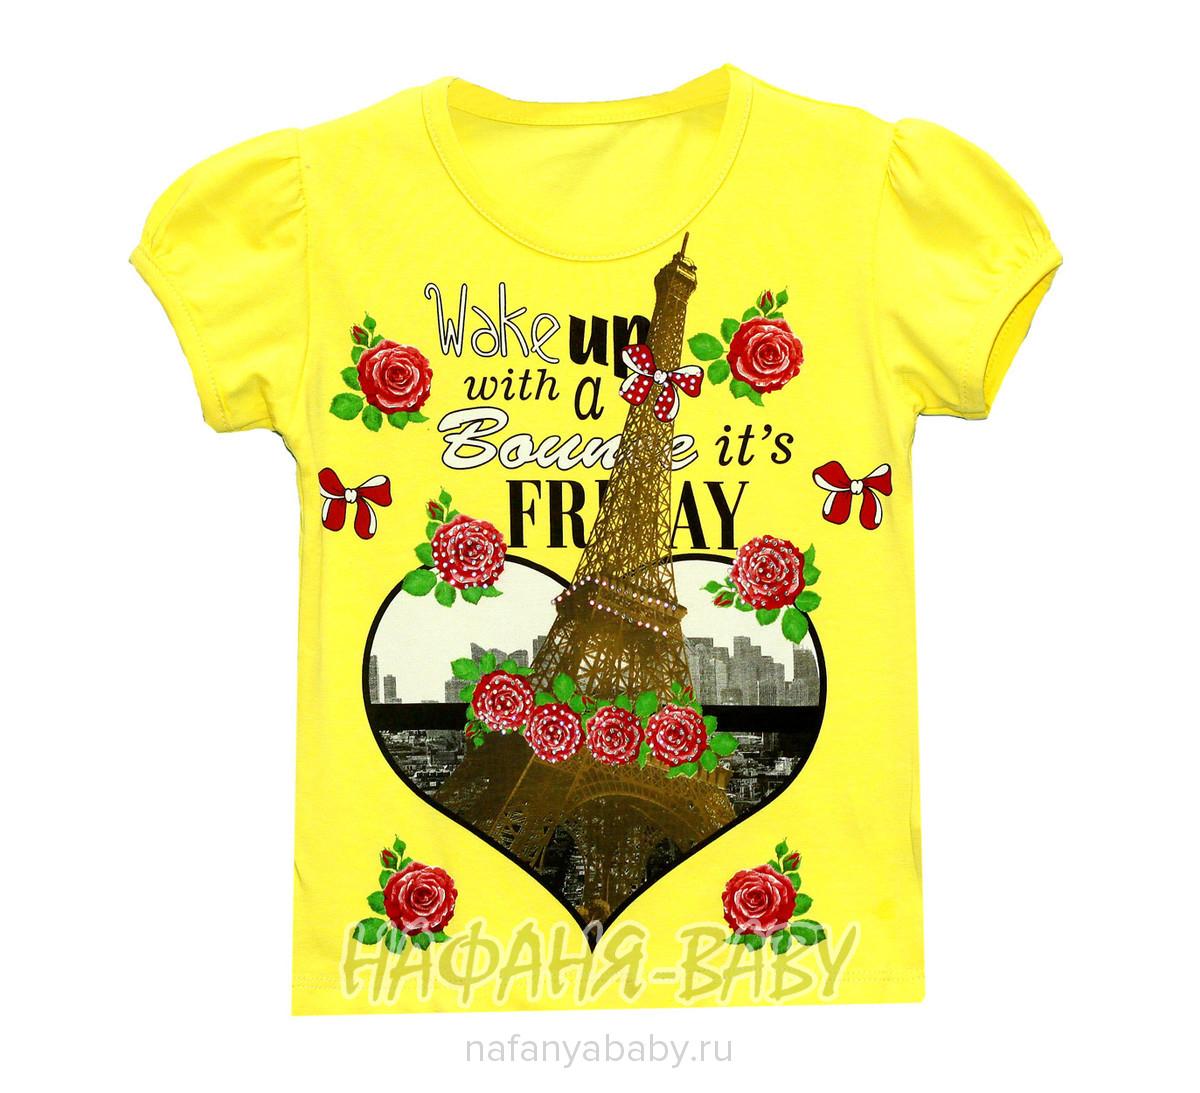 Детская футболка UNRULY арт: 2957, 5-9 лет, 1-4 года, цвет желтый, оптом Турция